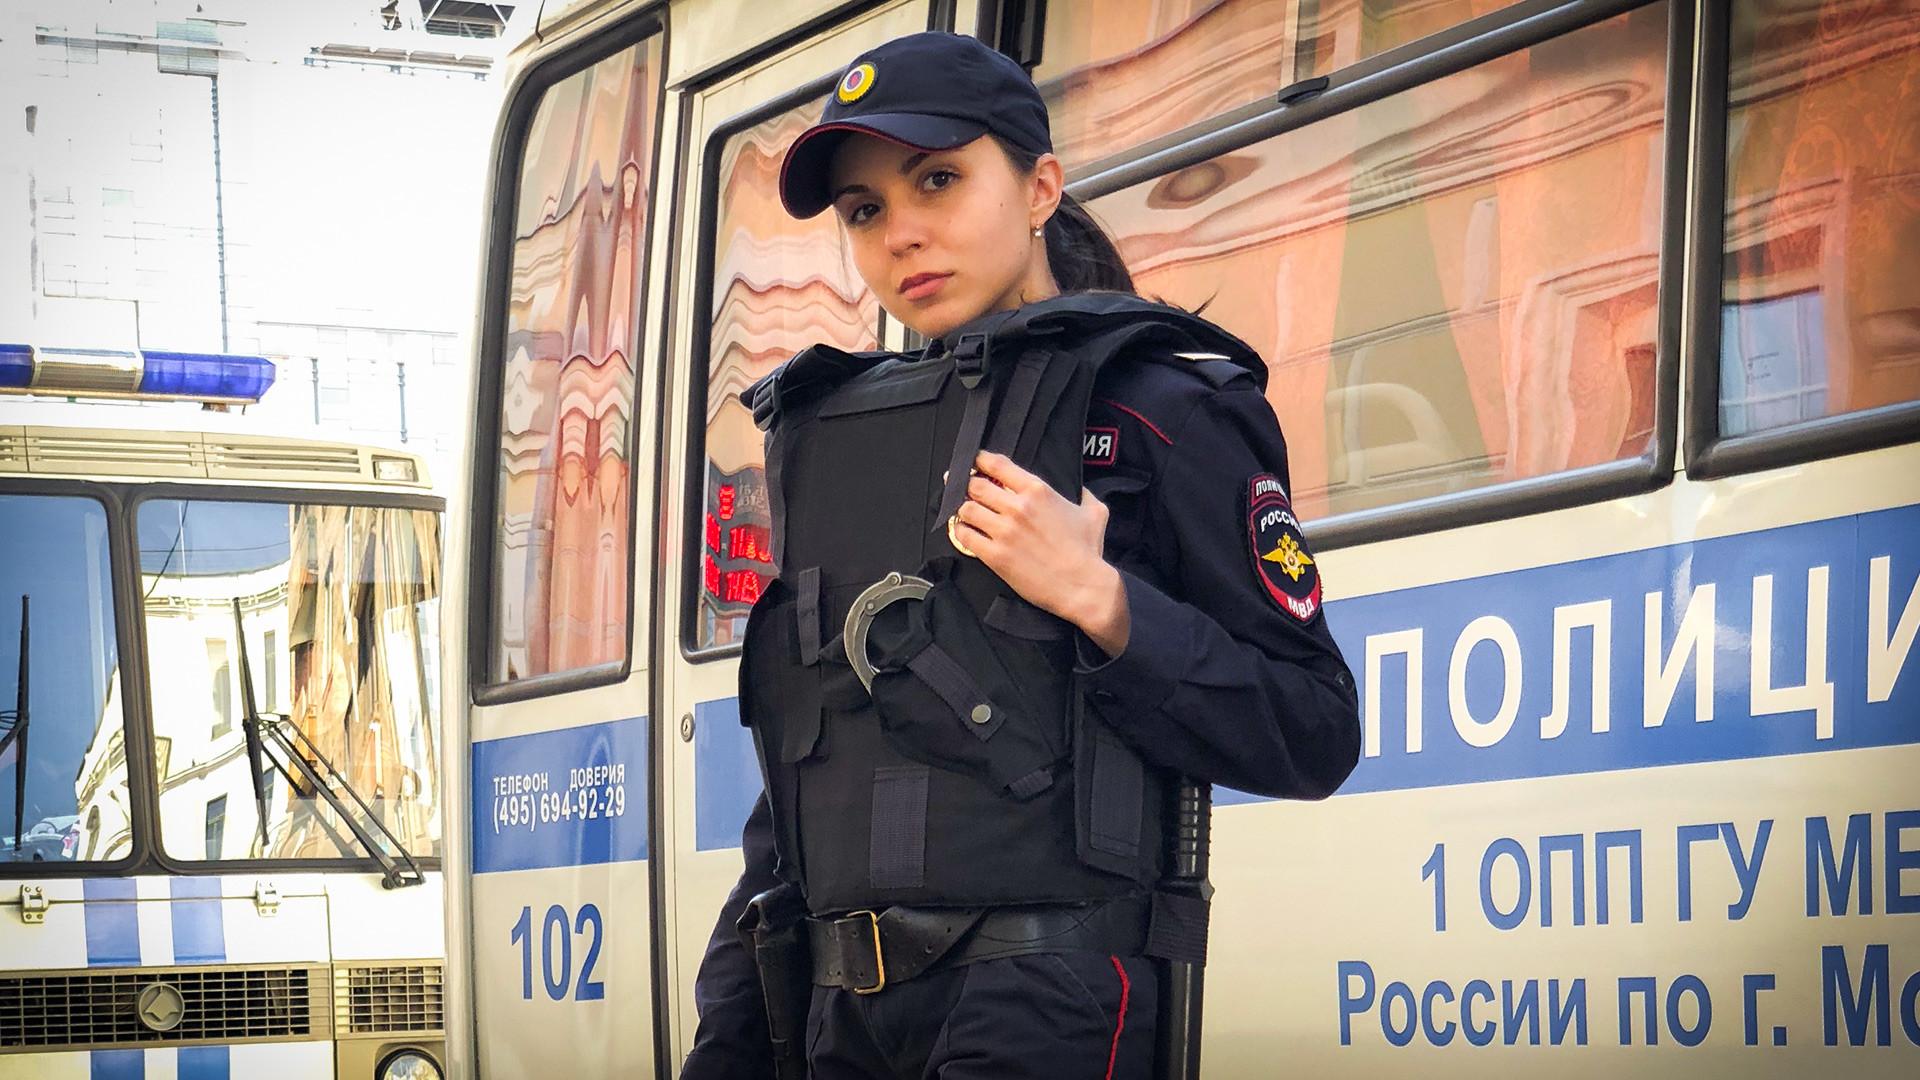 Yusupova policewoman